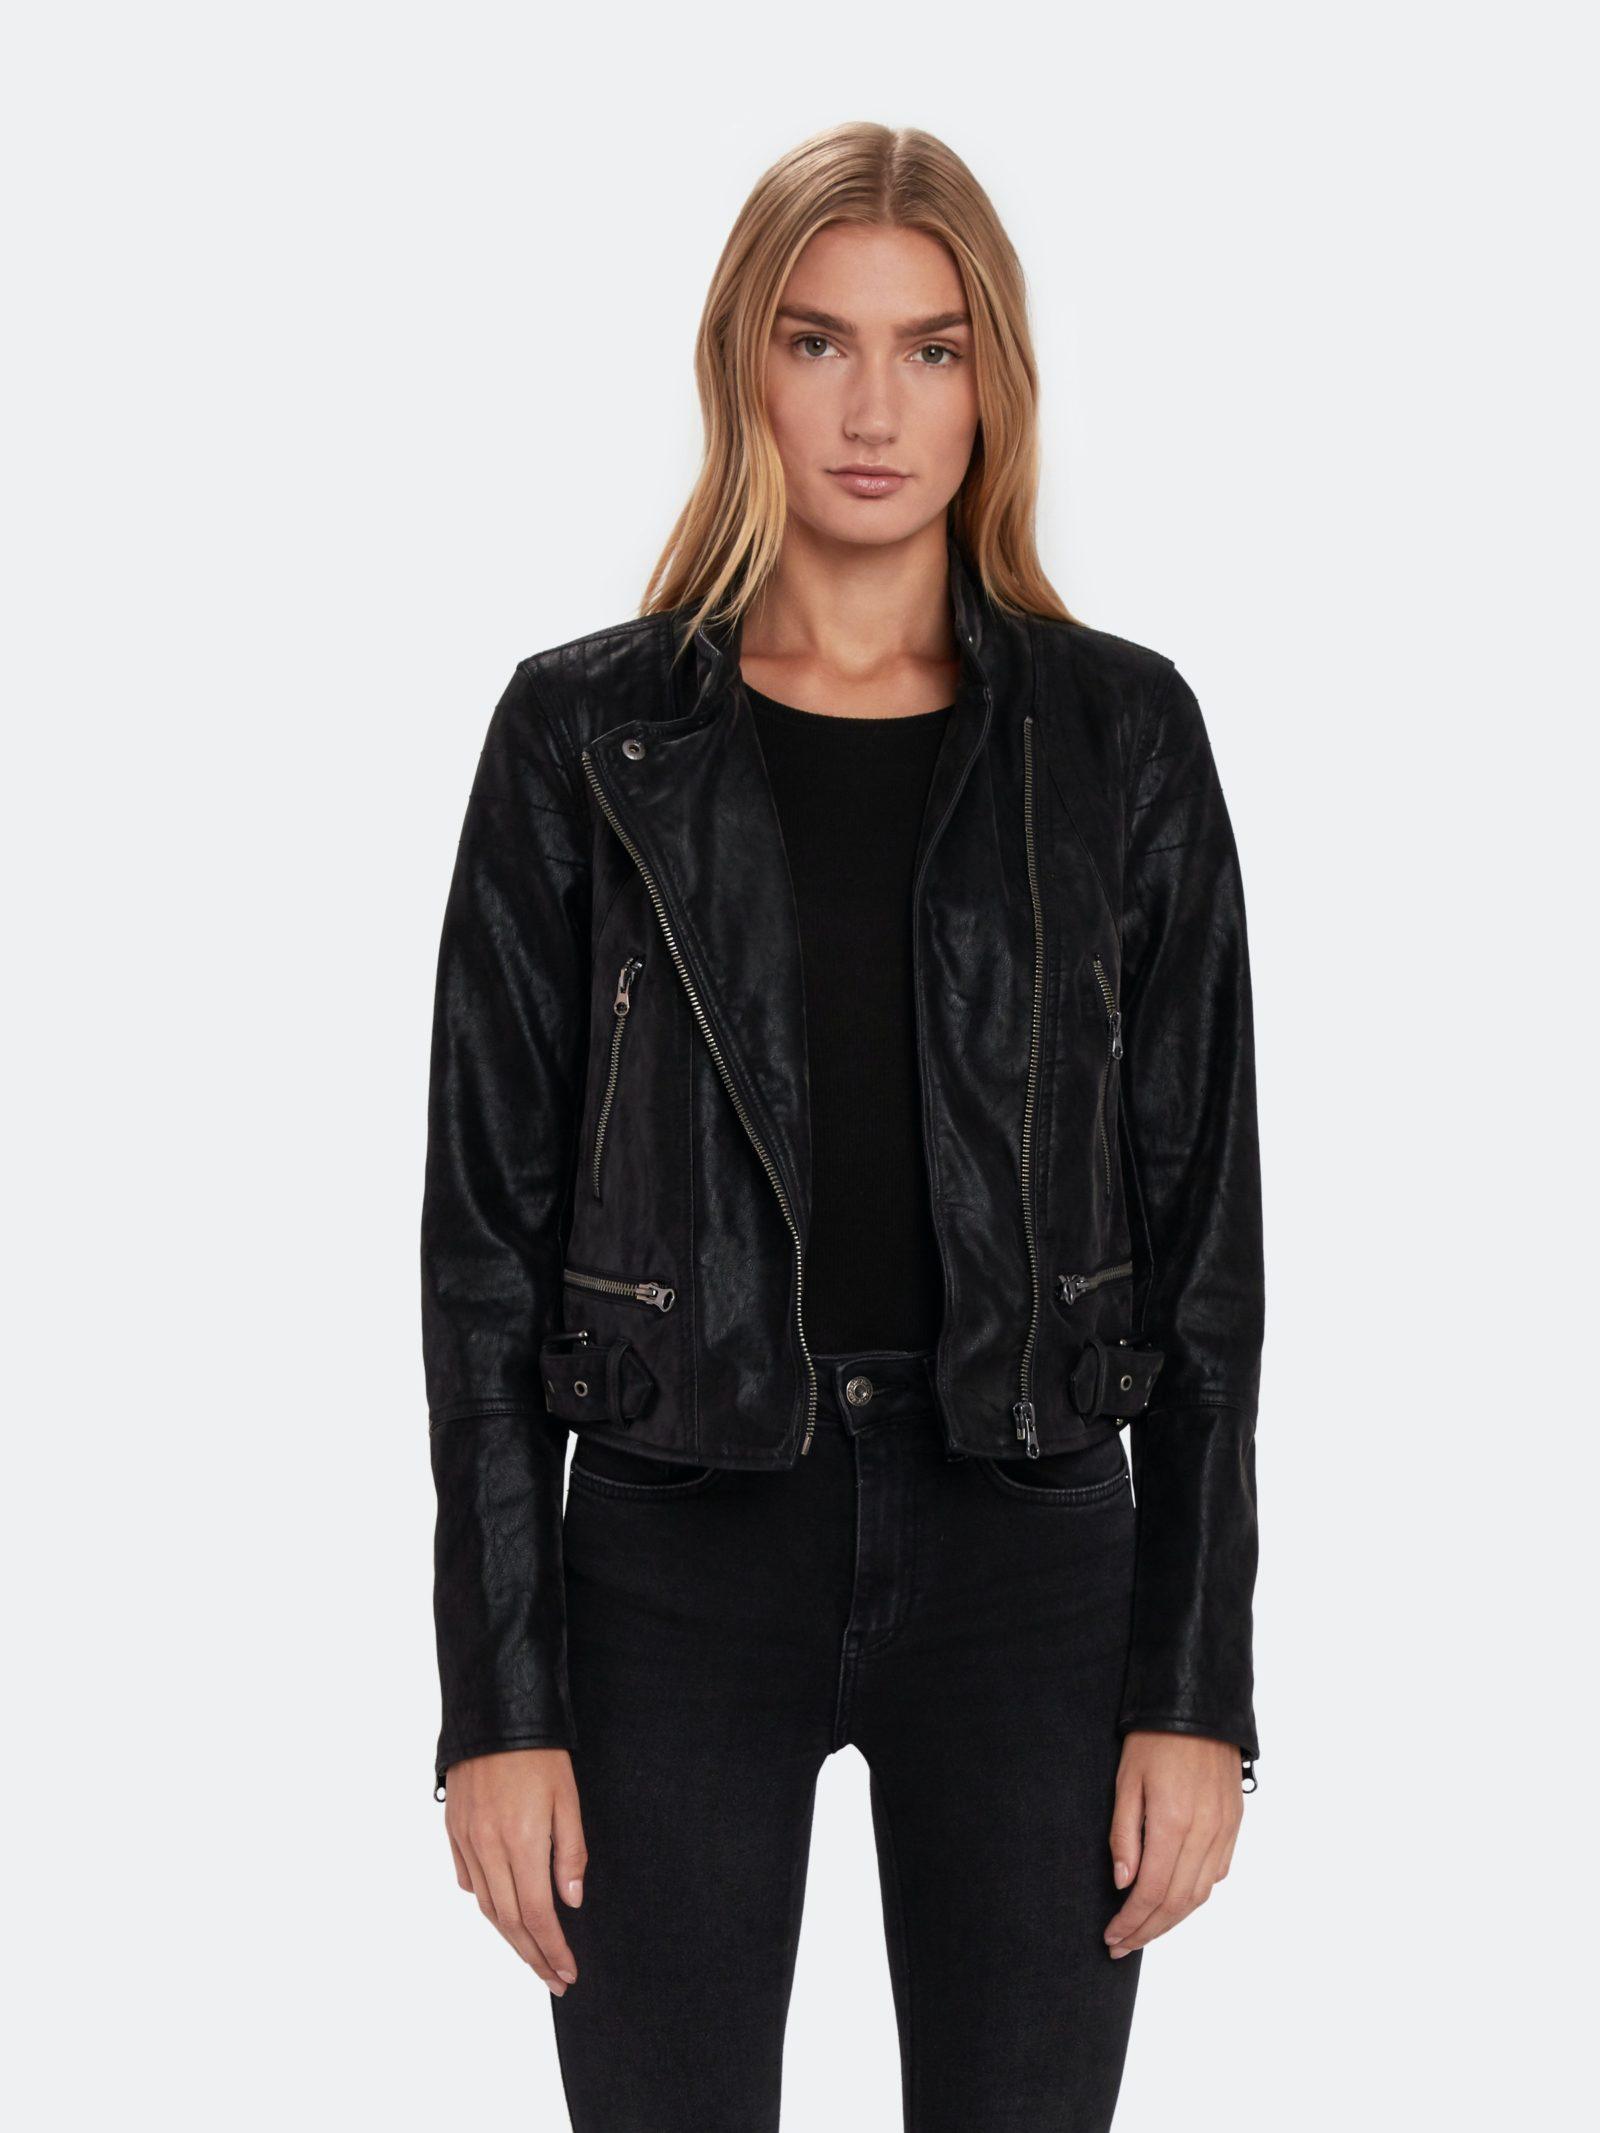 Verishop's Up To 80% Off Sale jacket